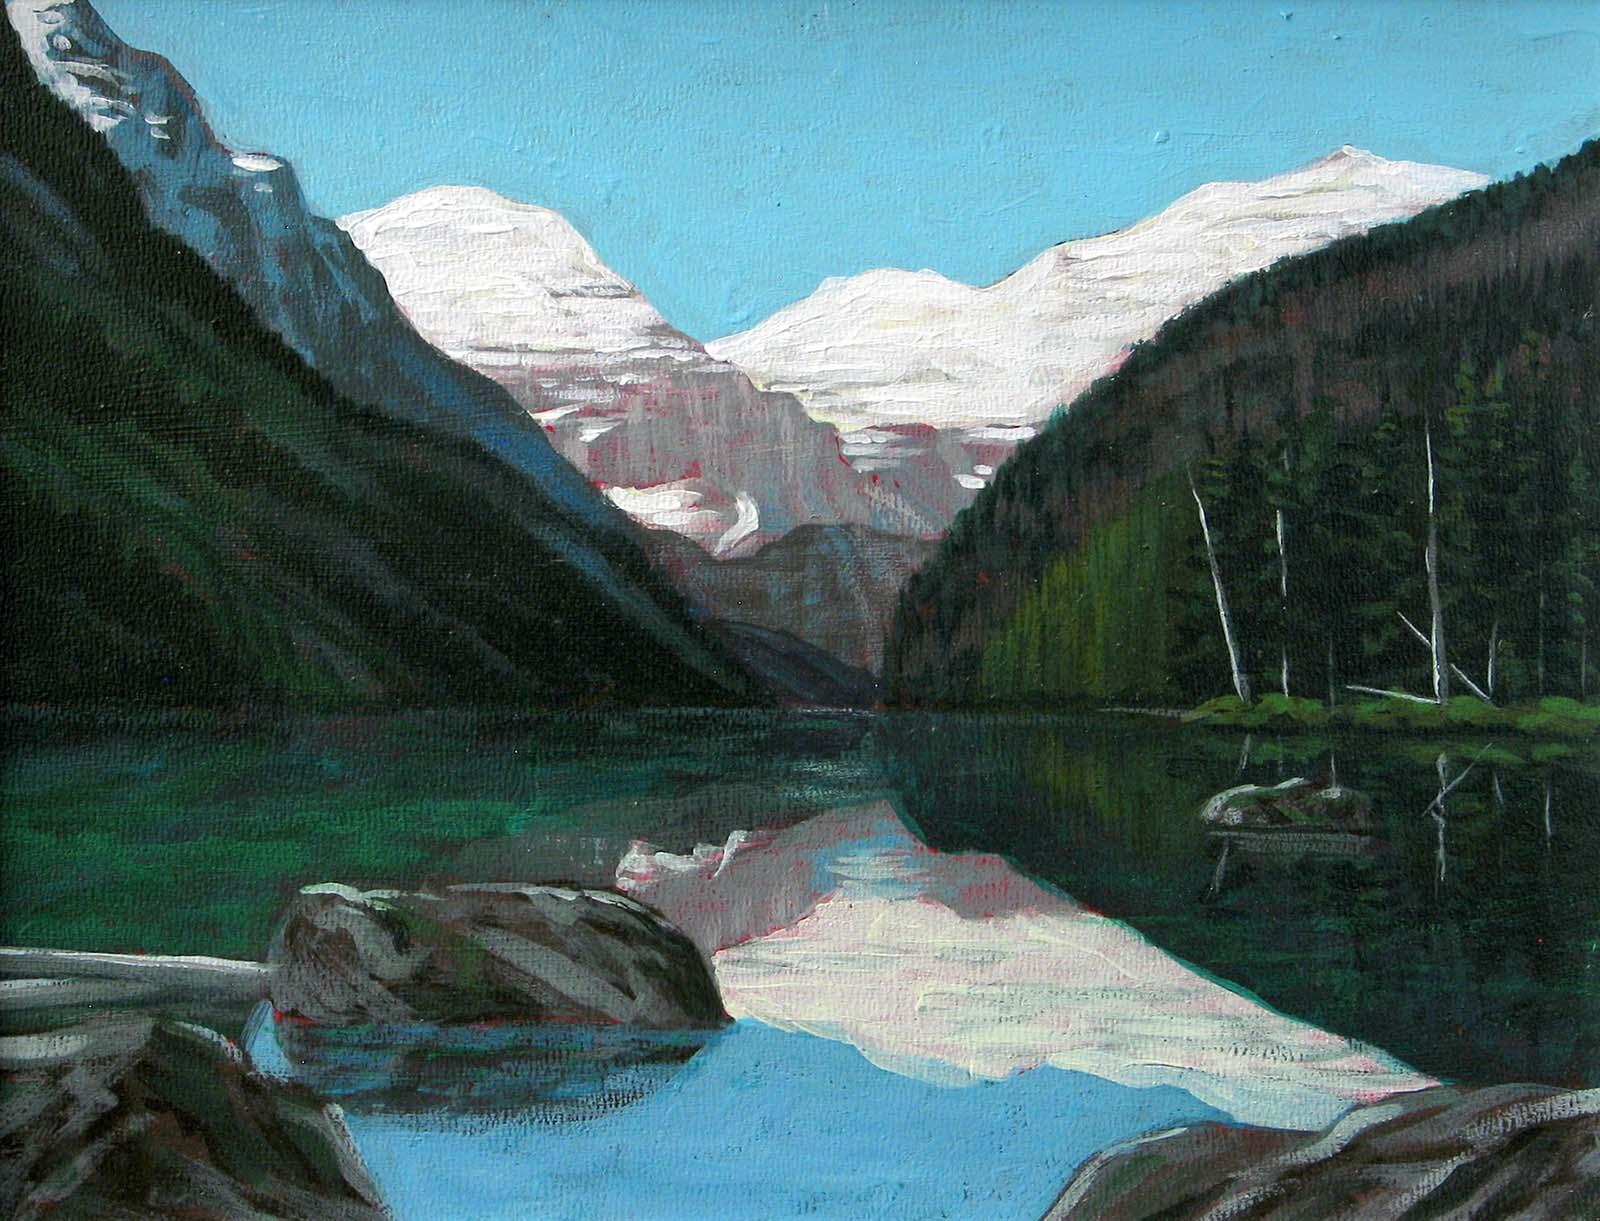 Lake Louise - Chris MacClure